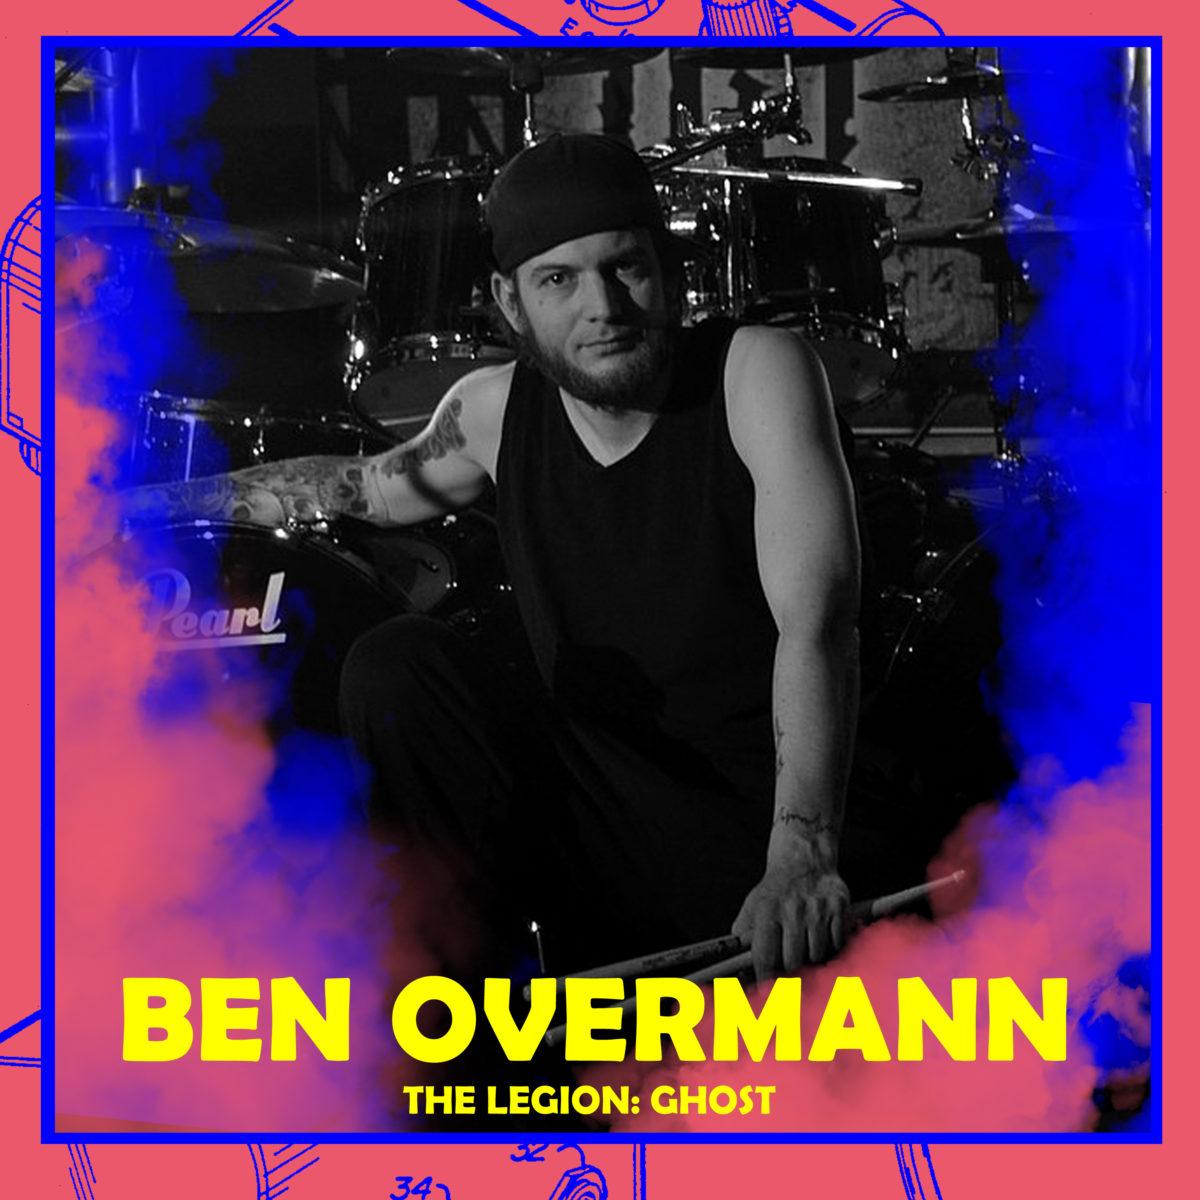 Ben Overmann (The Legion:Ghost)